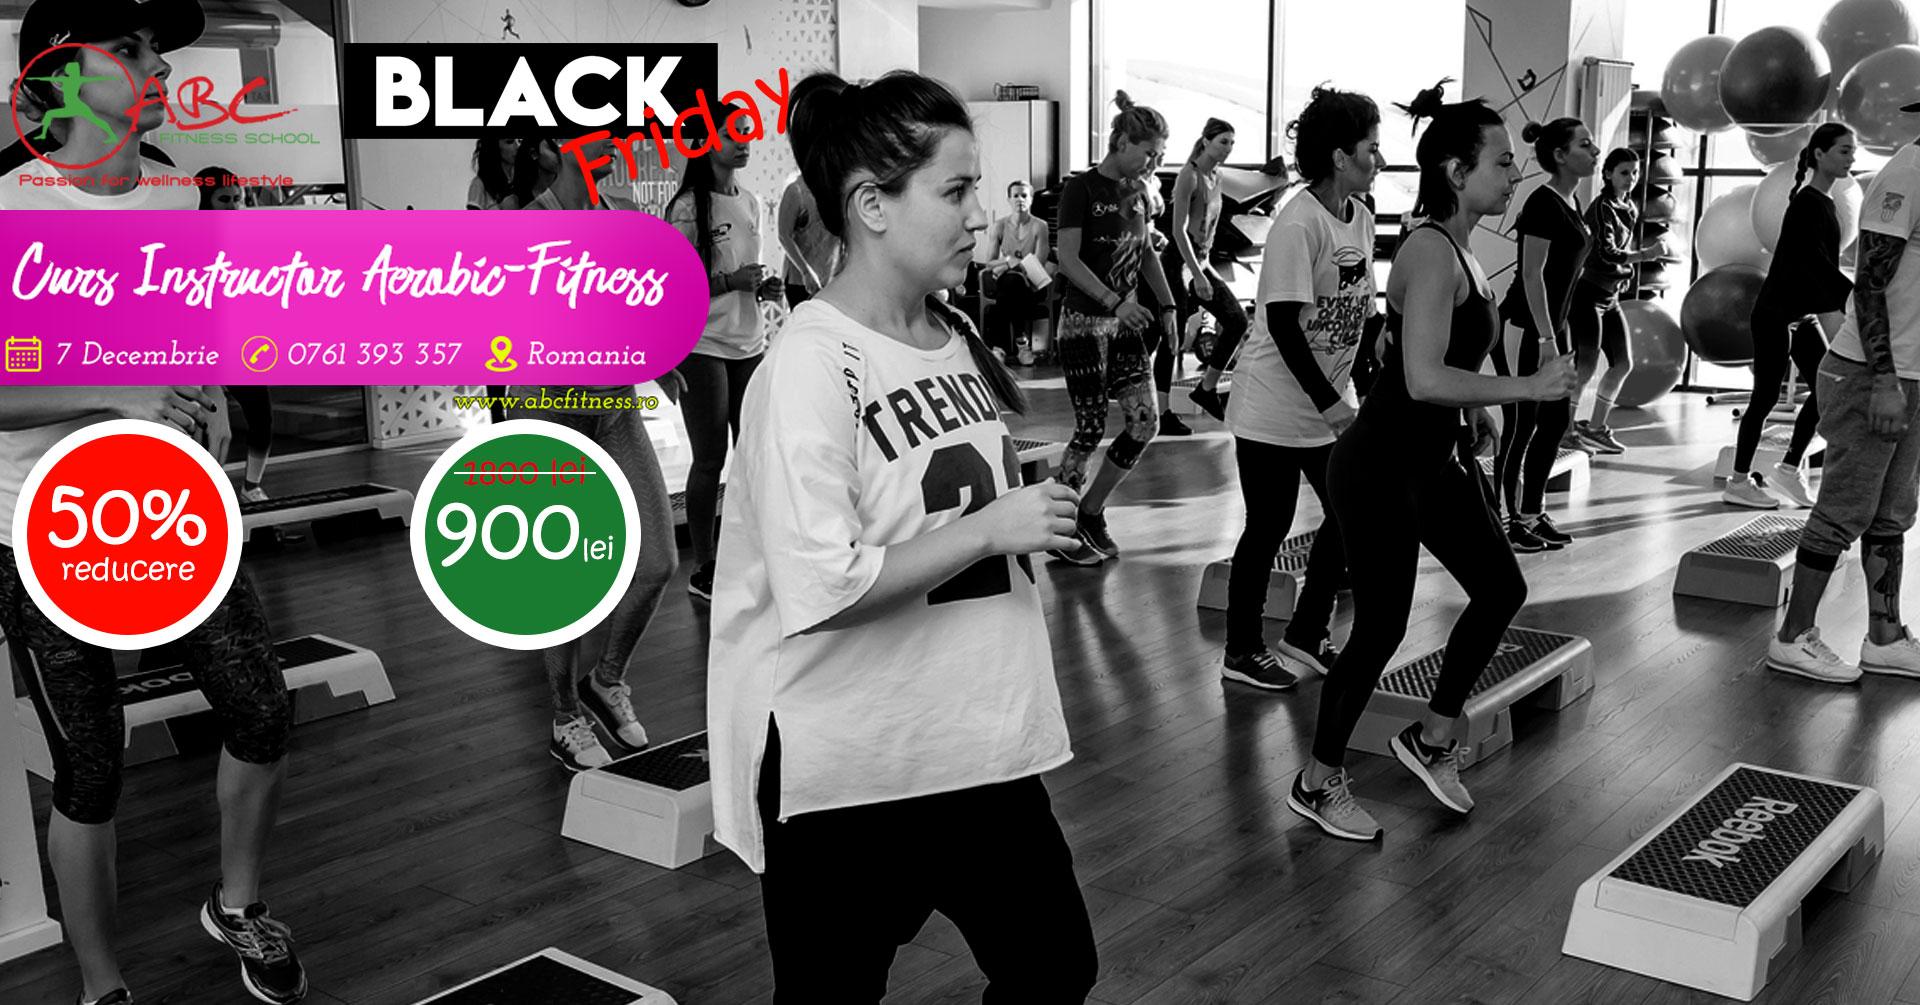 curs aerobic fitness blackfriday